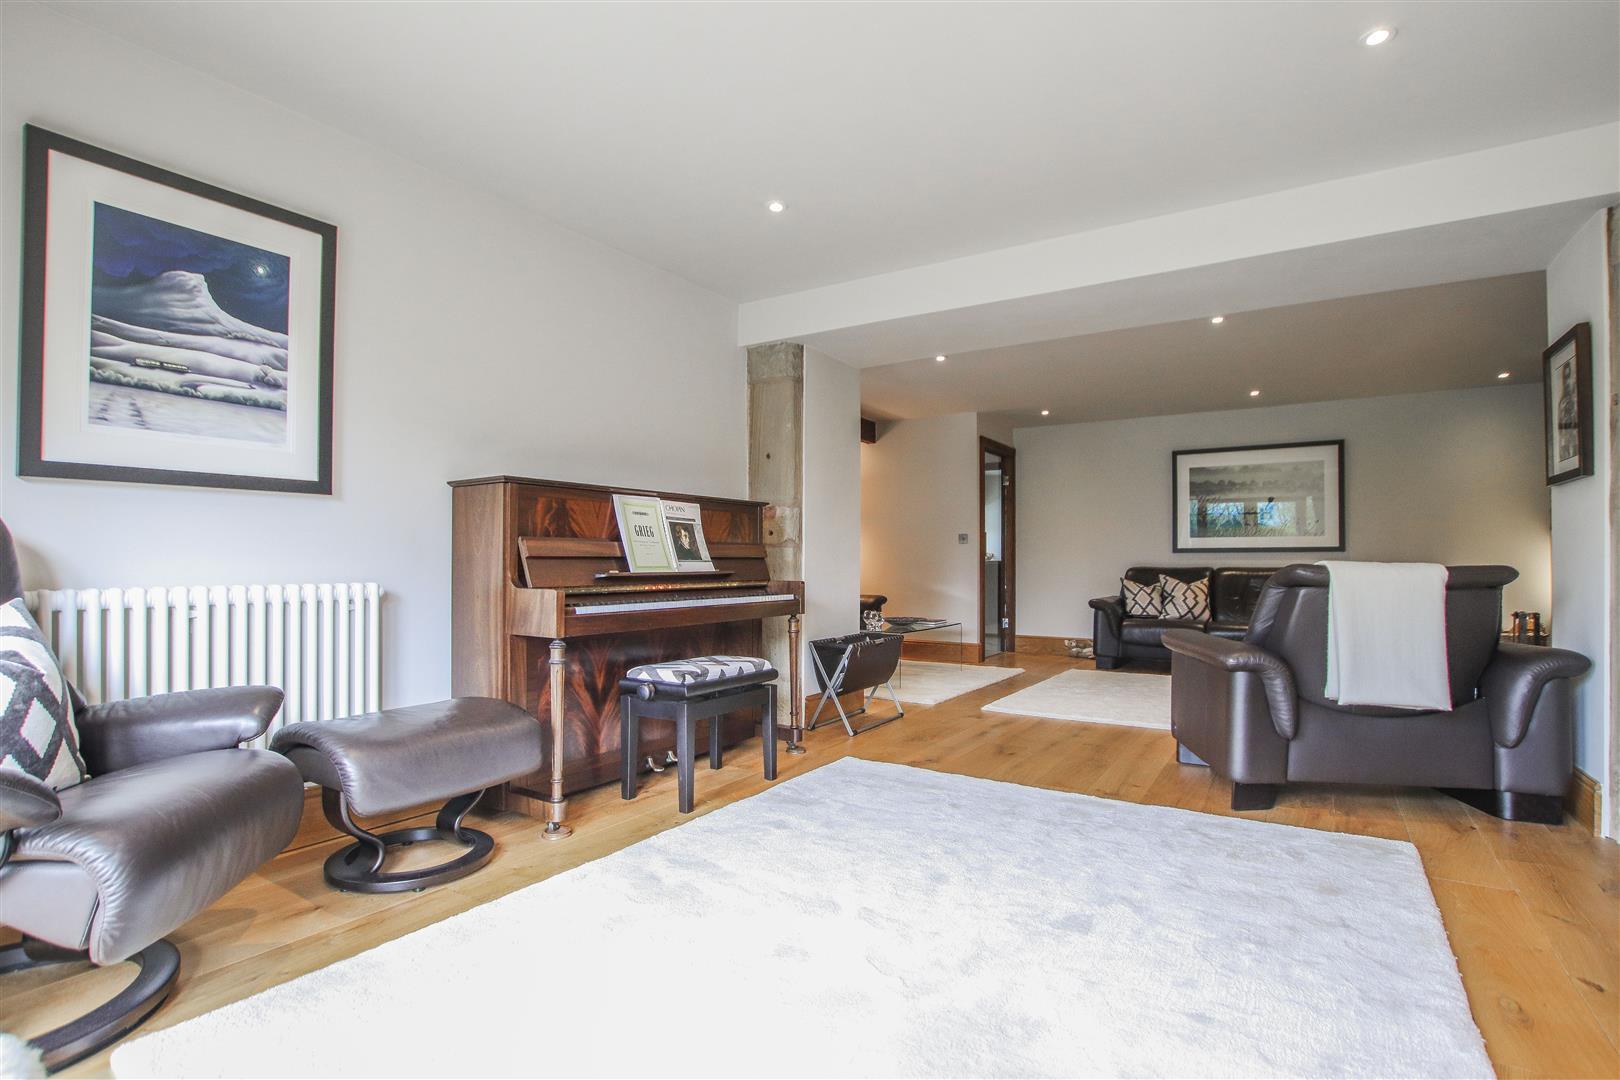 5 Bedroom Semi-detached House For Sale - 40.JPG